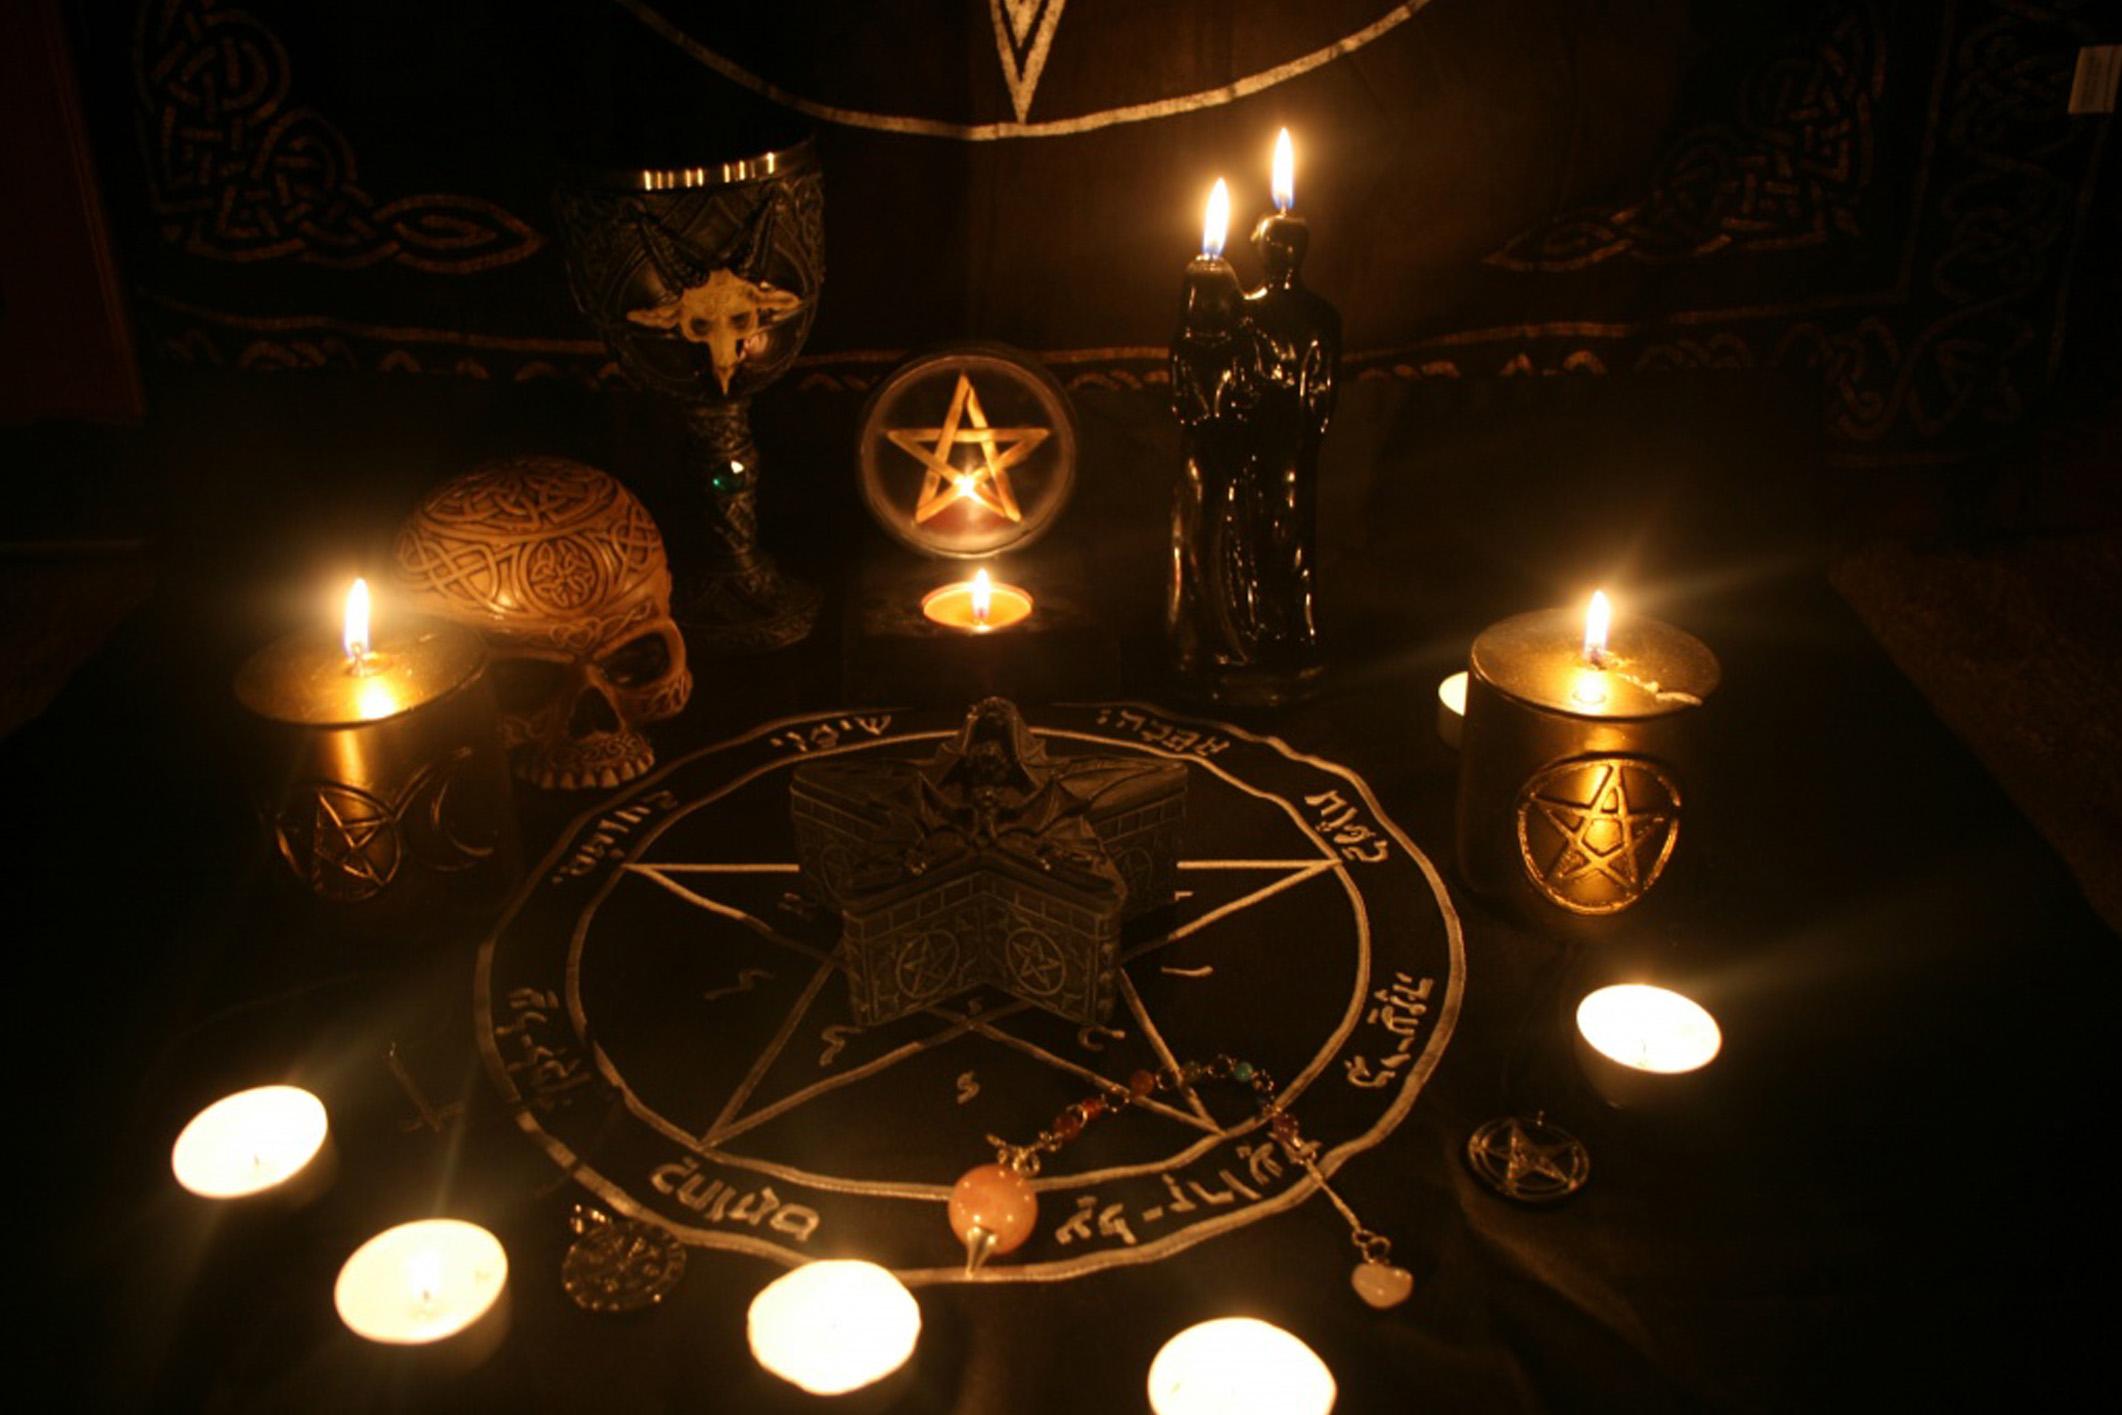 Astrologer in Banashankari | Astrologer Bhanukumar Best